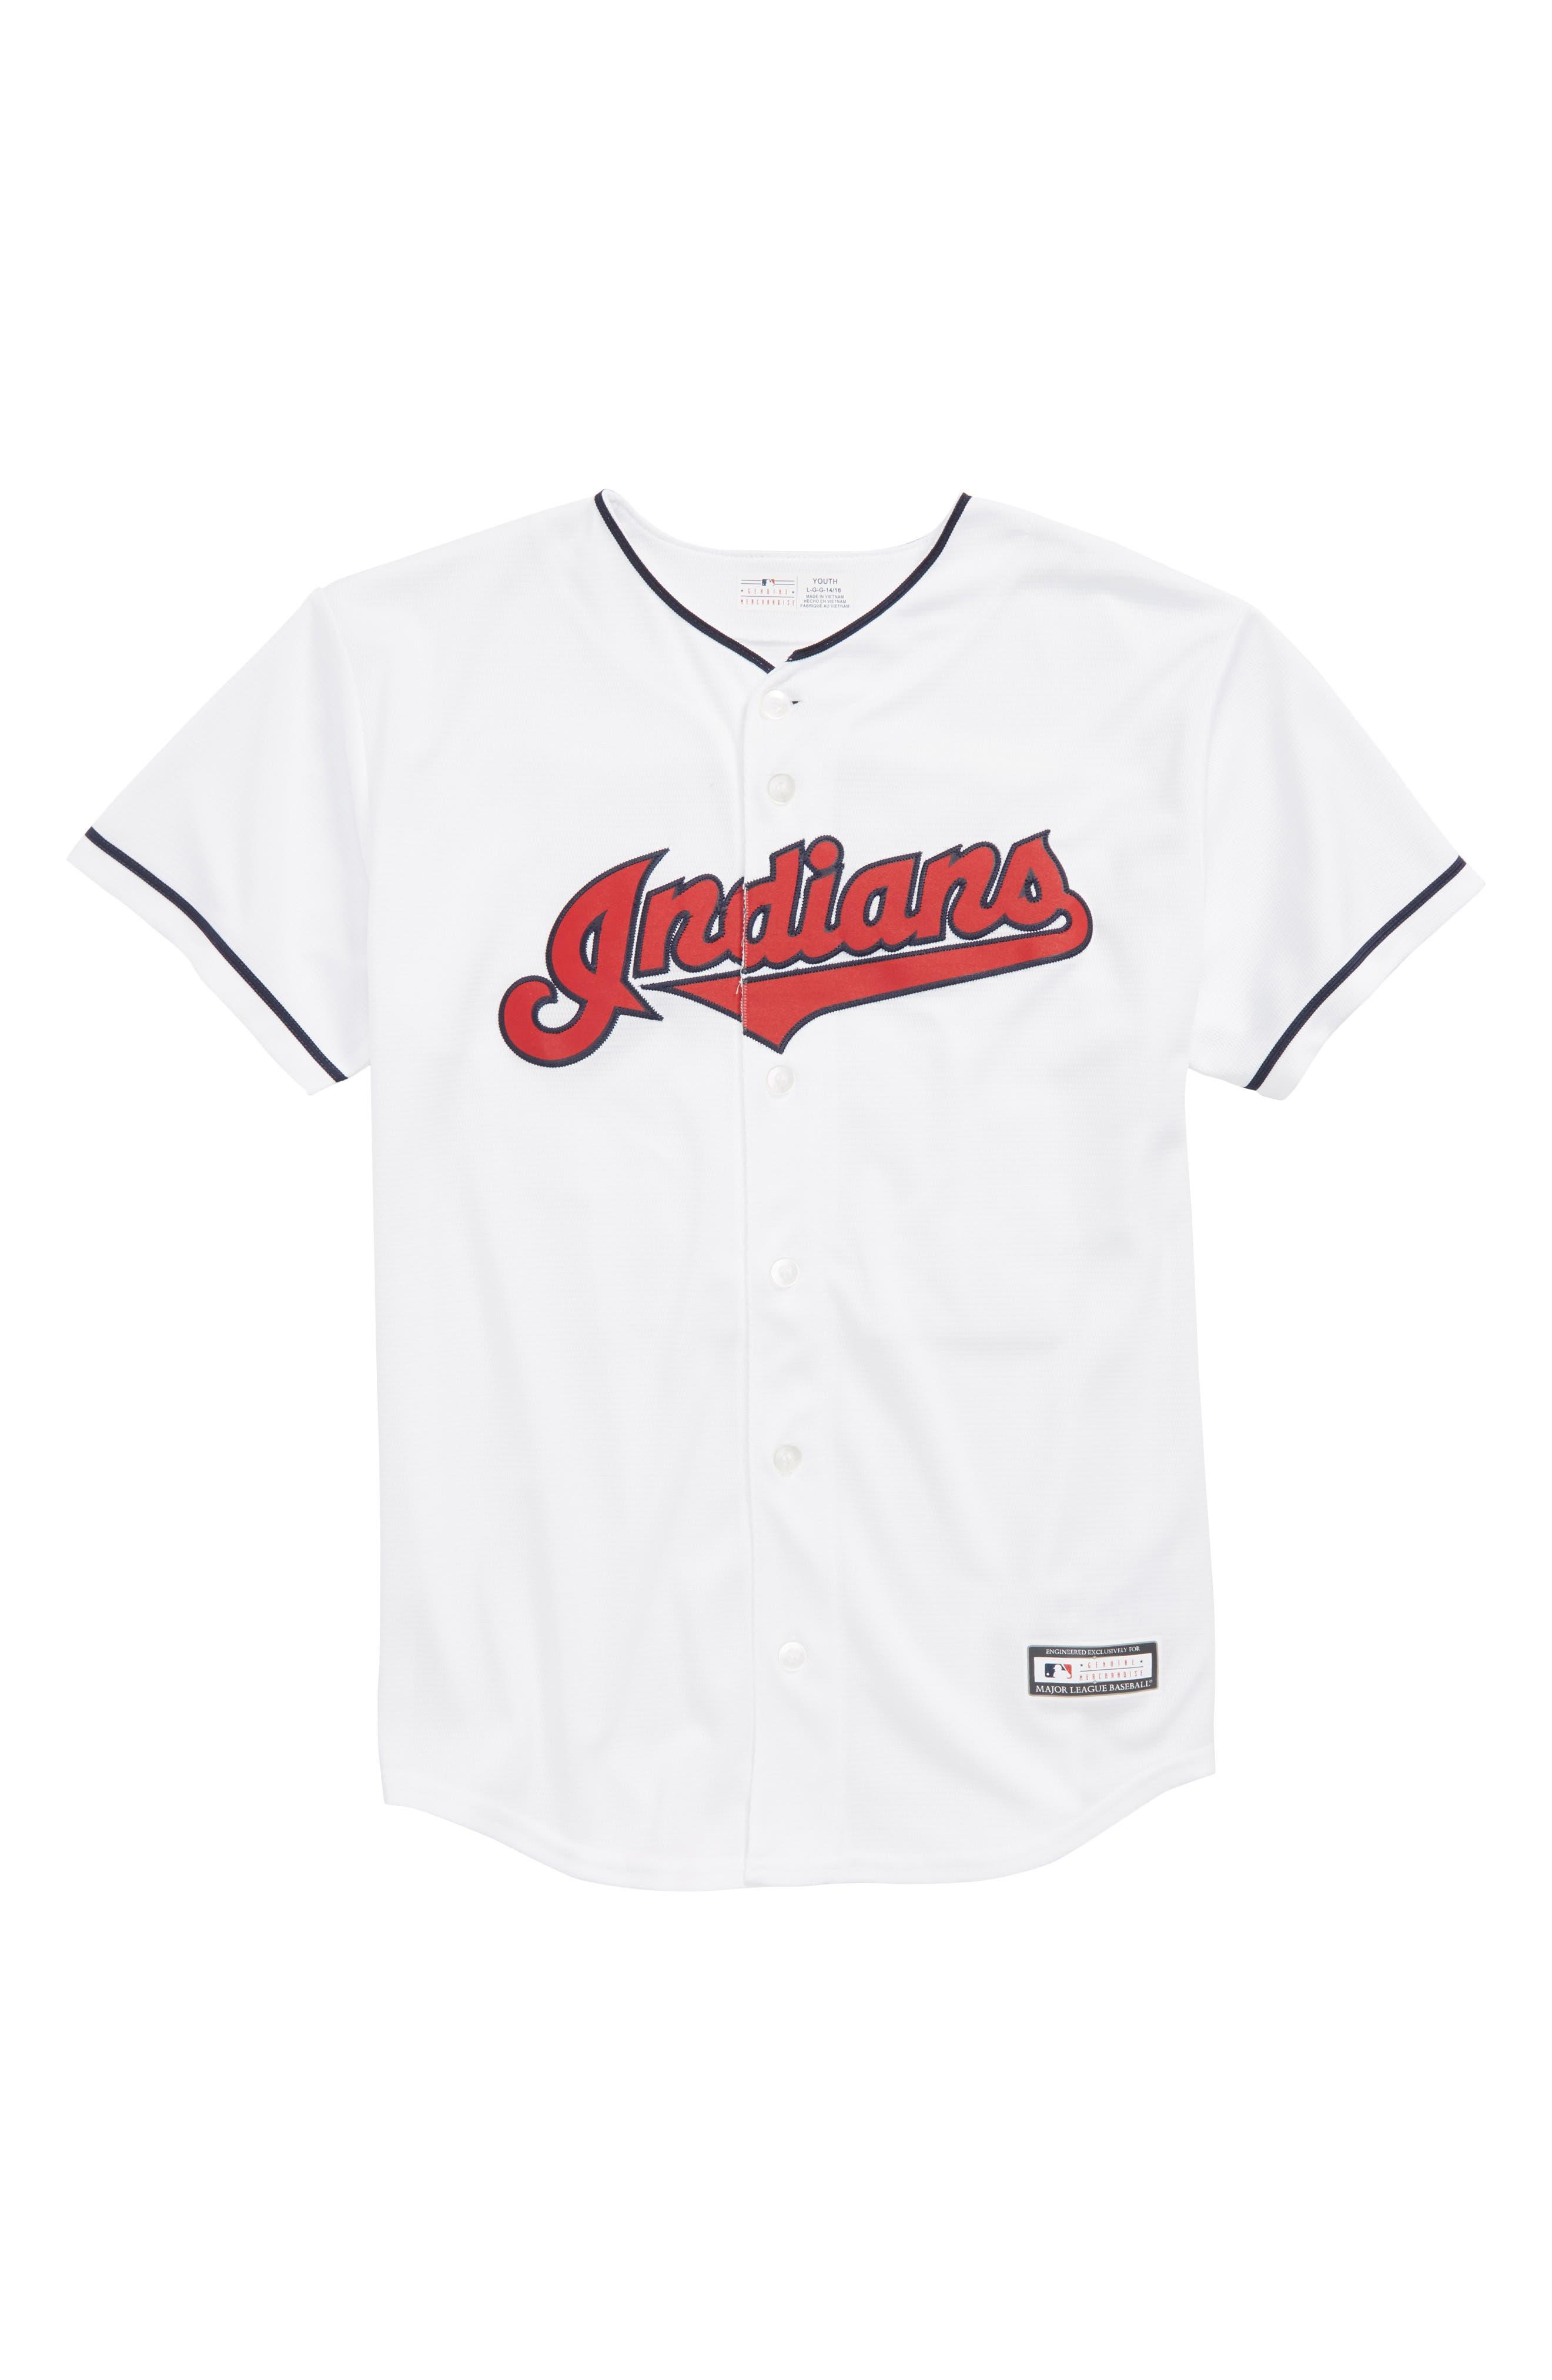 Cleveland Indians - Francisco Lindor Baseball Jersey,                             Main thumbnail 1, color,                             100